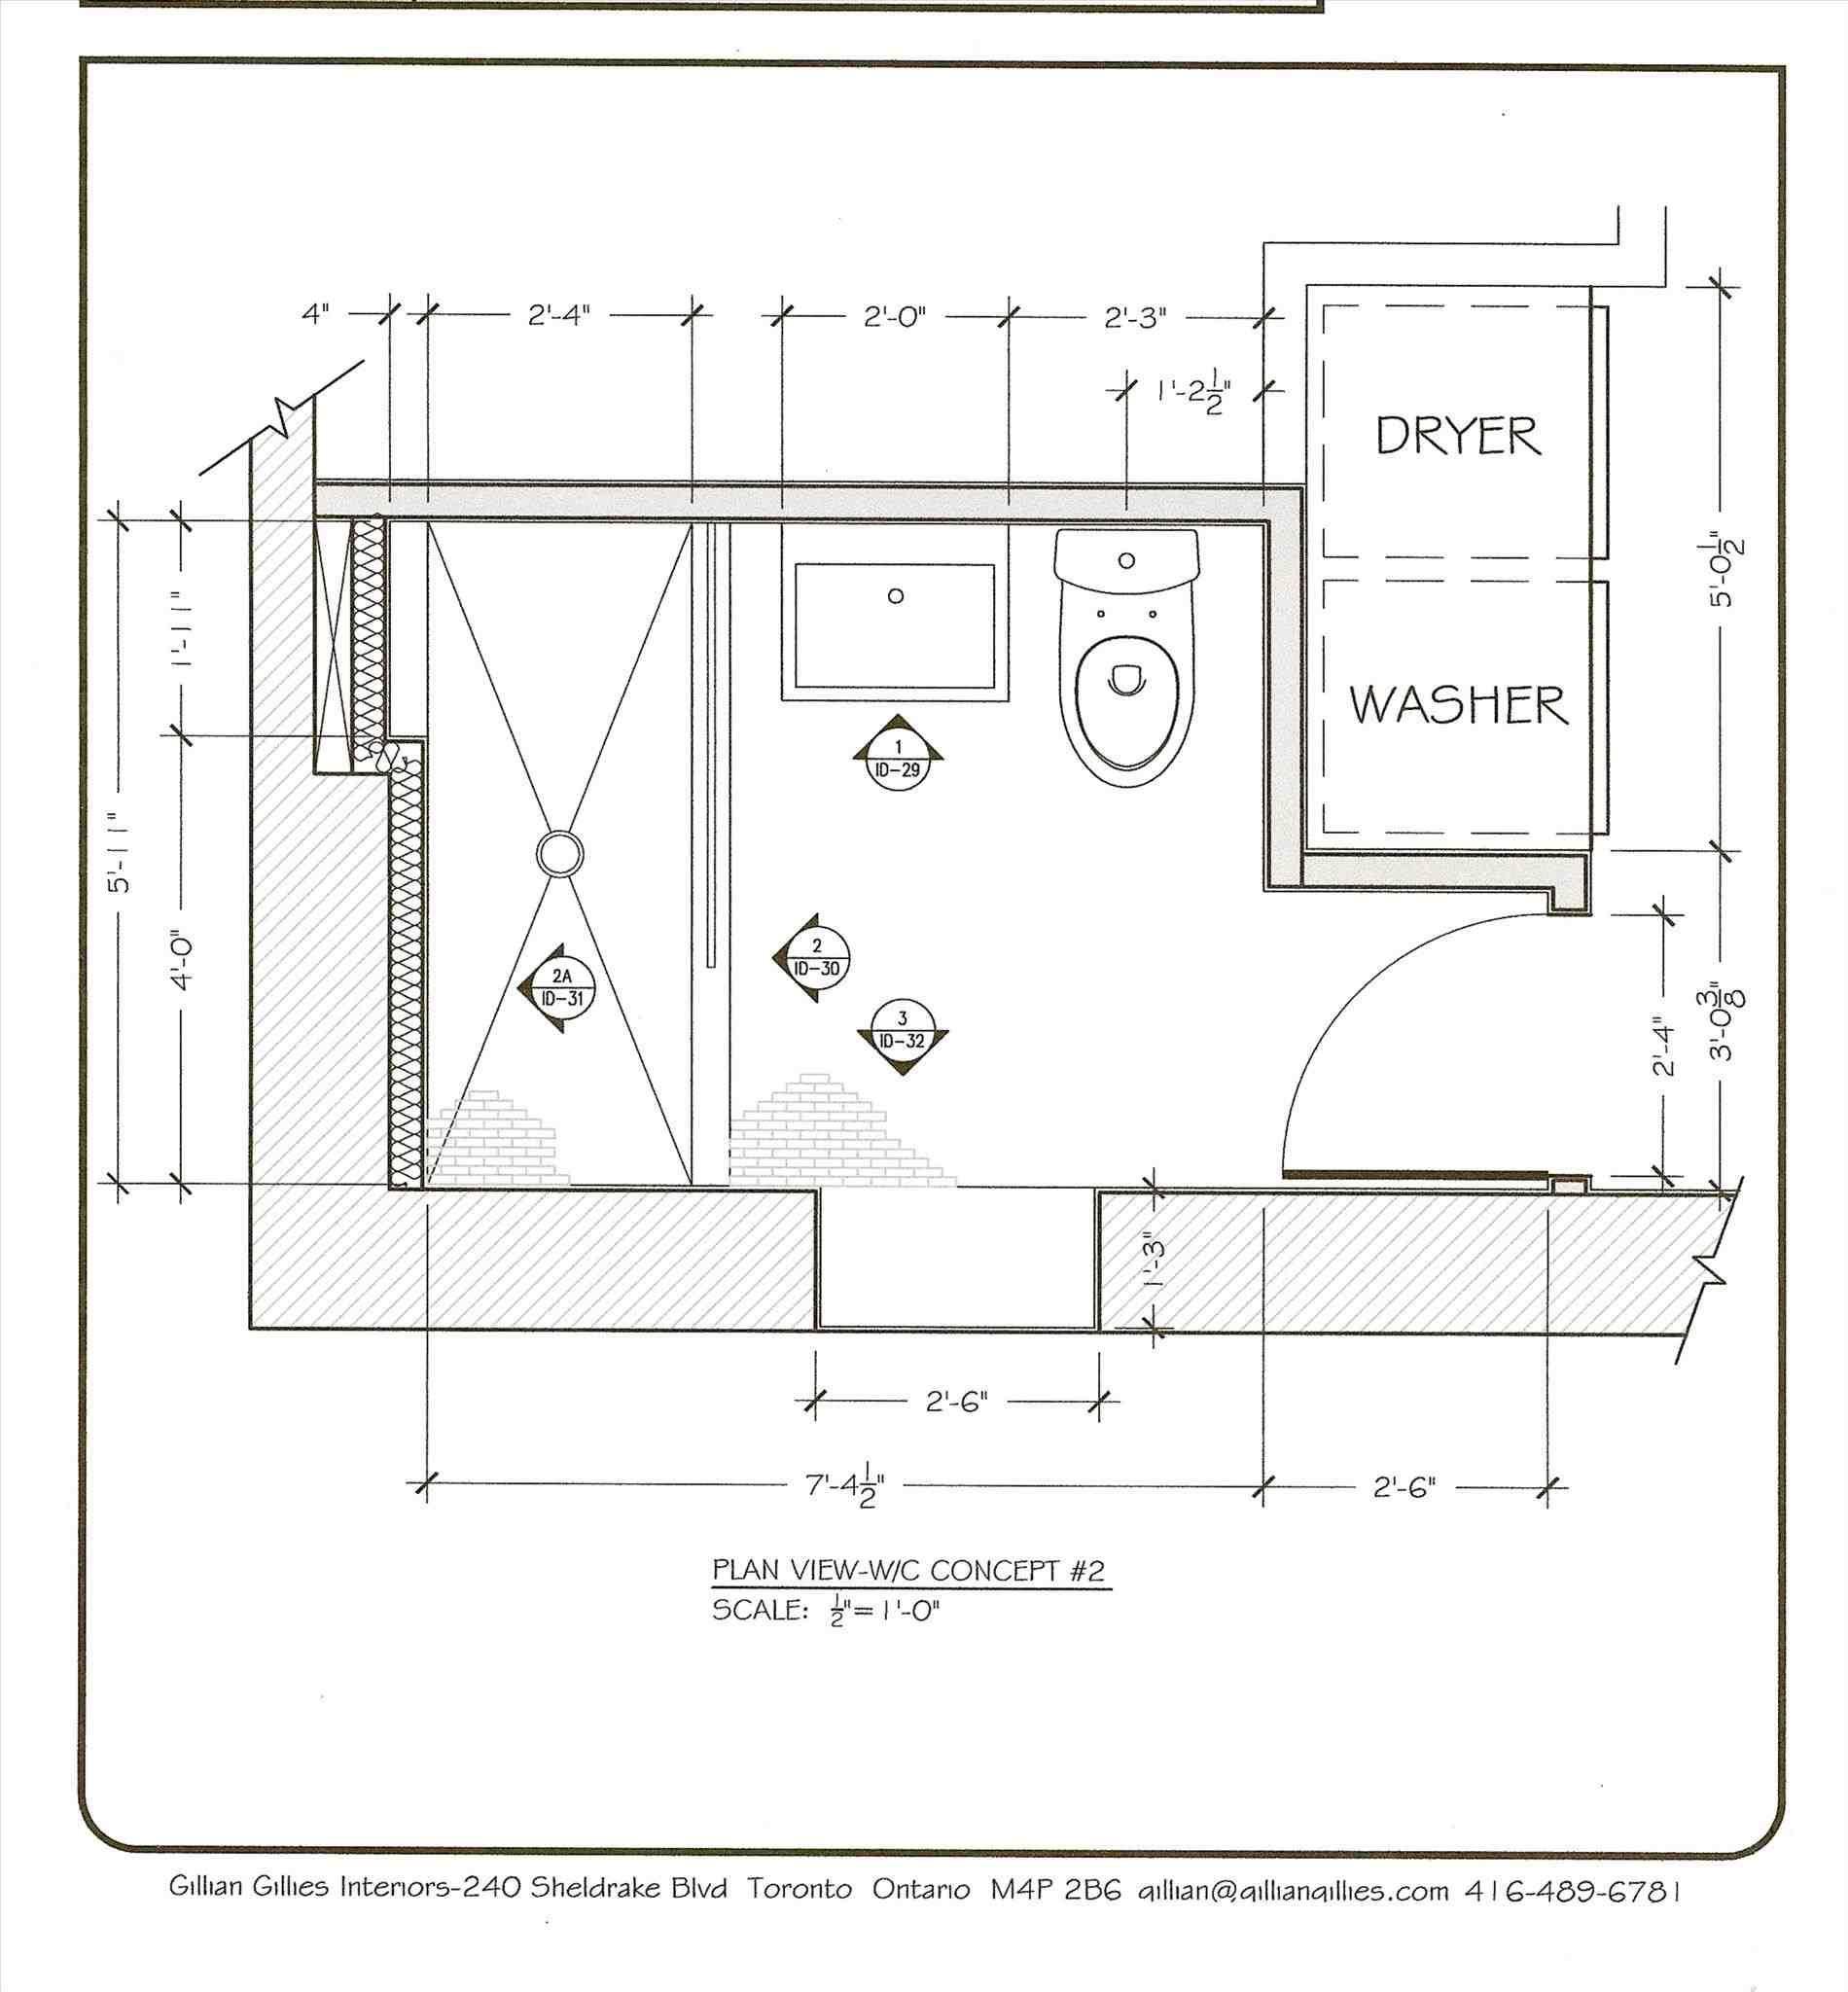 This Master Bathroom Floor Plans With Walk In Shower Doorless Walk In Shower Ideas Layout B Master Bathroom Layout Bathroom Floor Plans Closet Design Layout